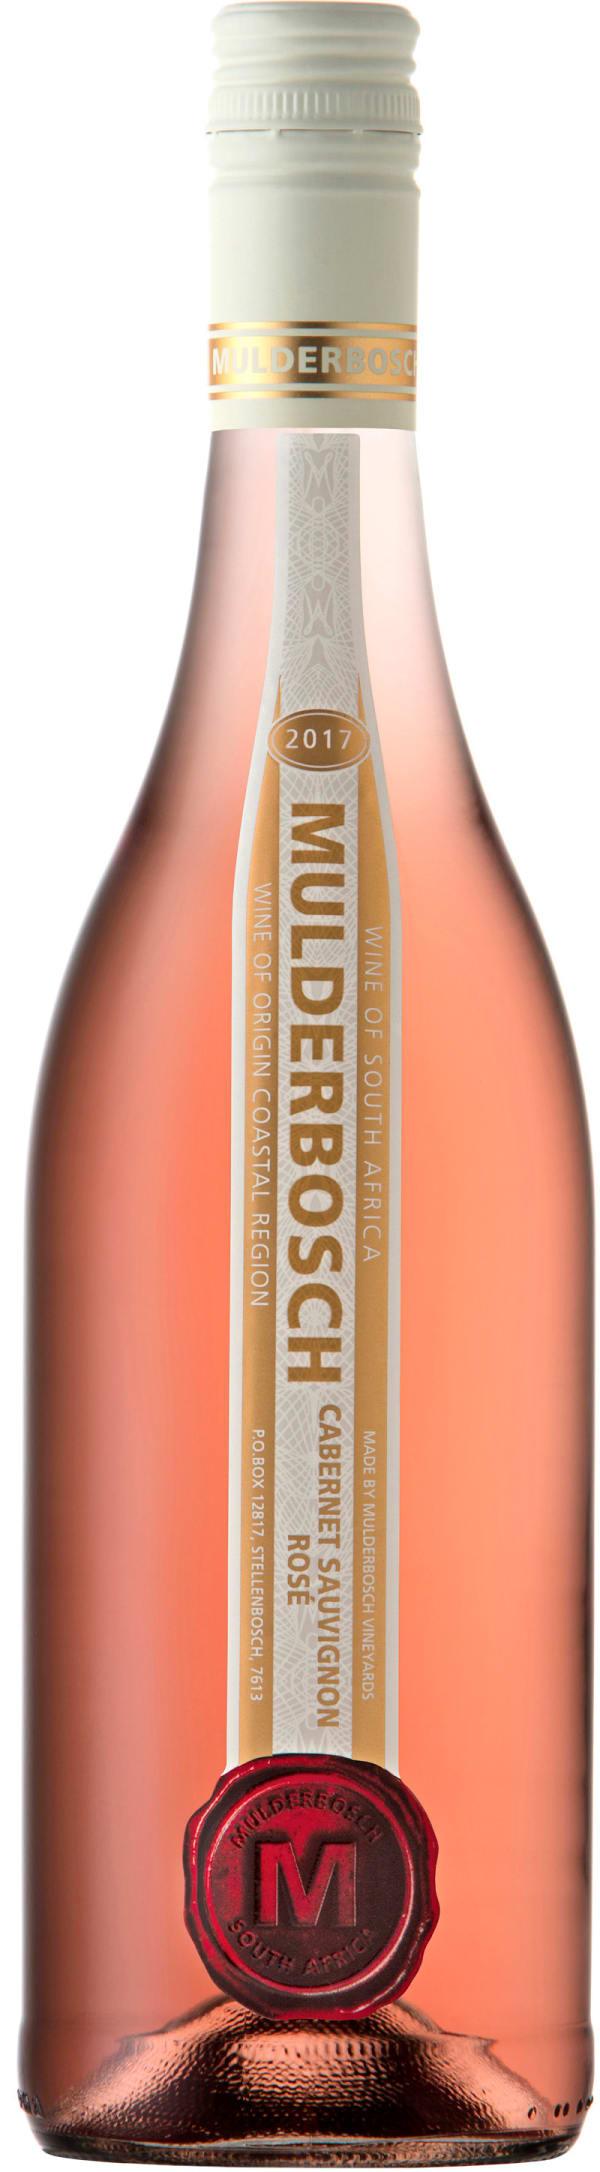 Mulderbosch Cabernet Sauvignon Rosé 2018